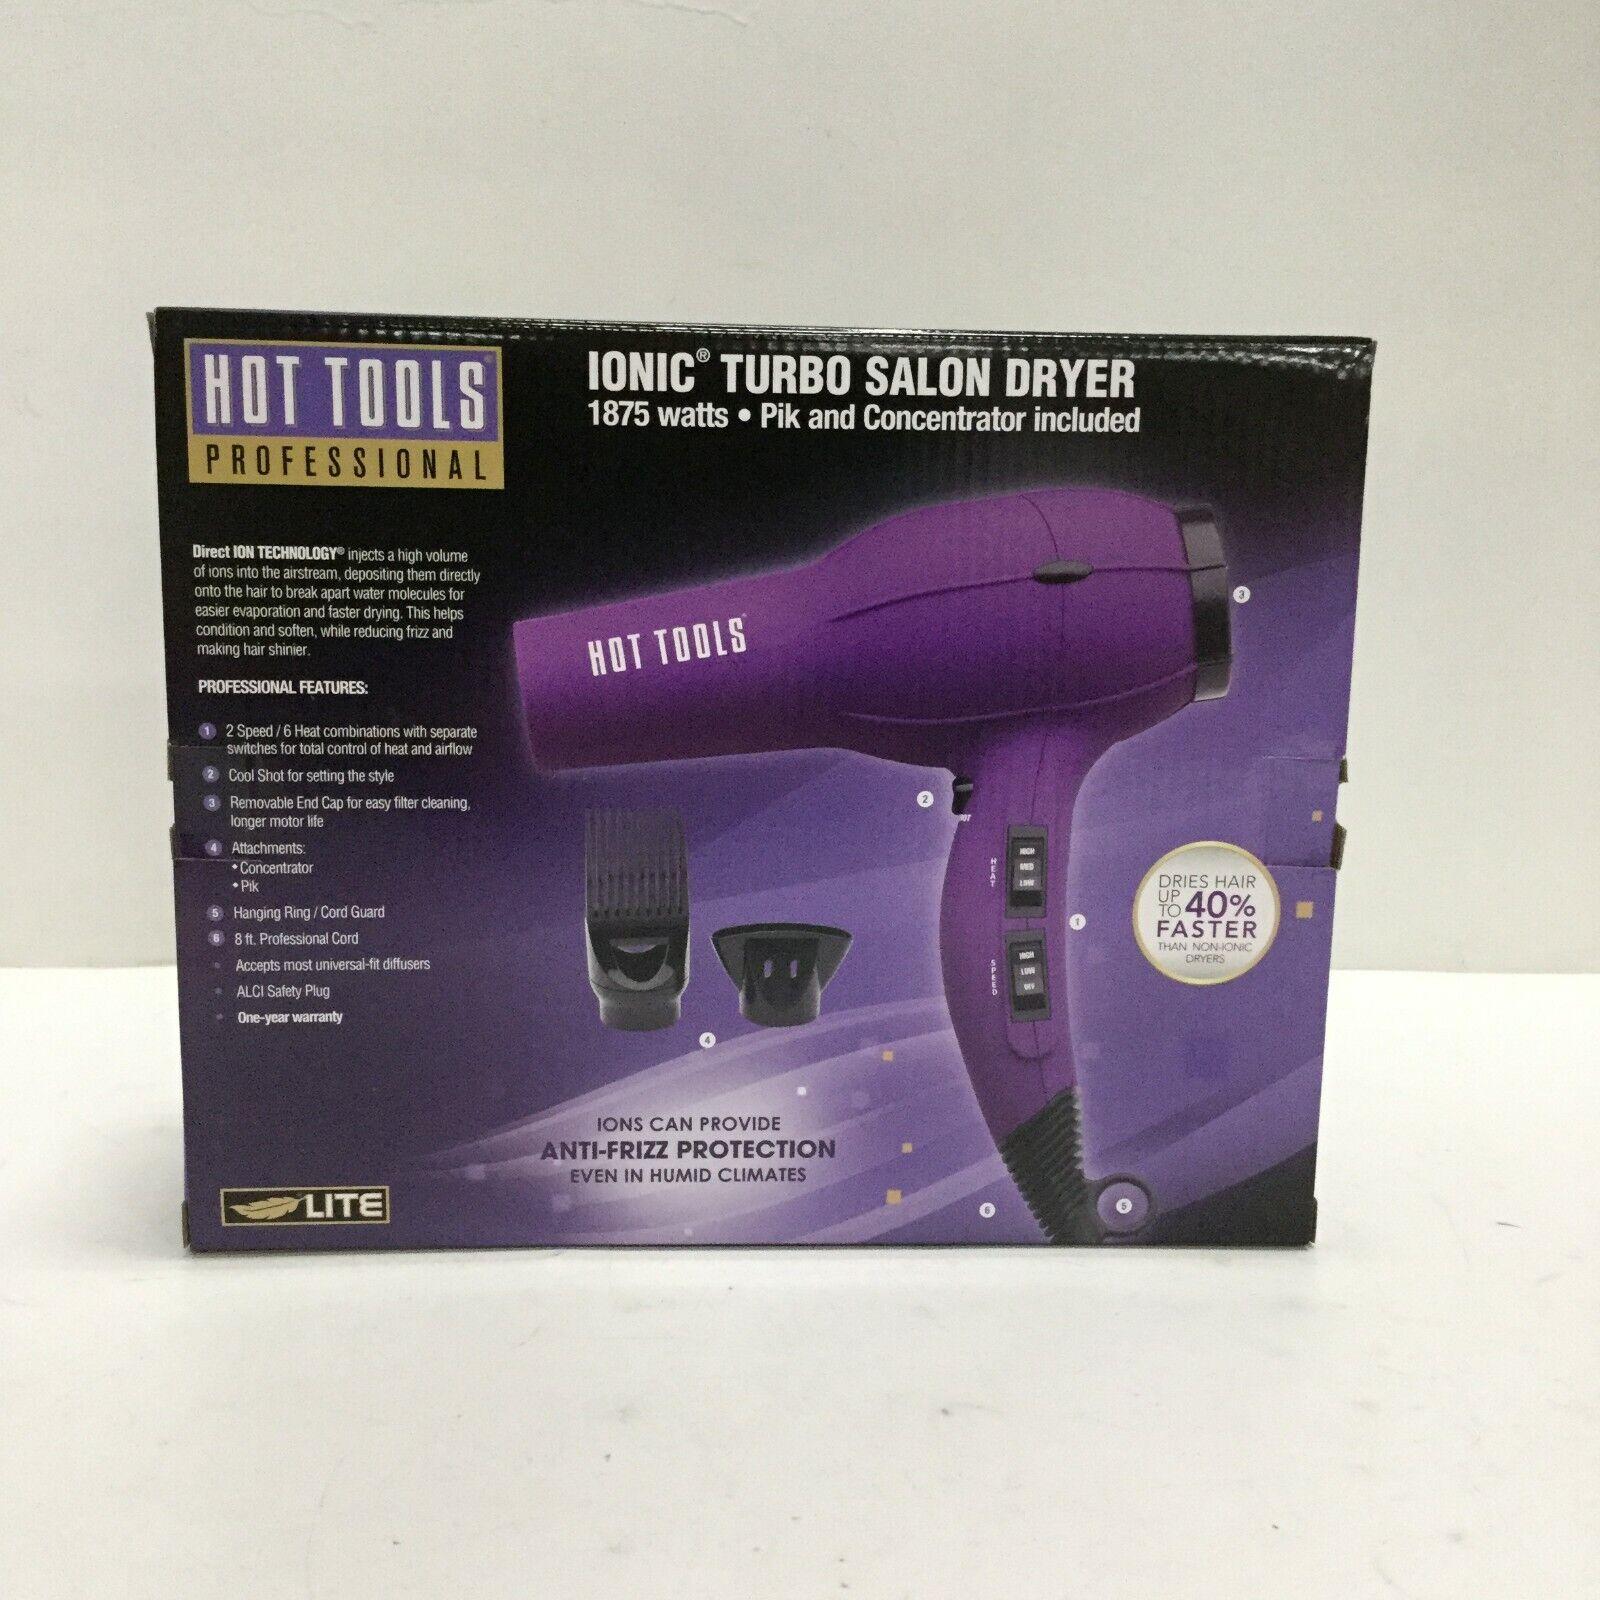 HOT TOOLS Ionic Turbo Salon Dryer 1875 Watts, Purple